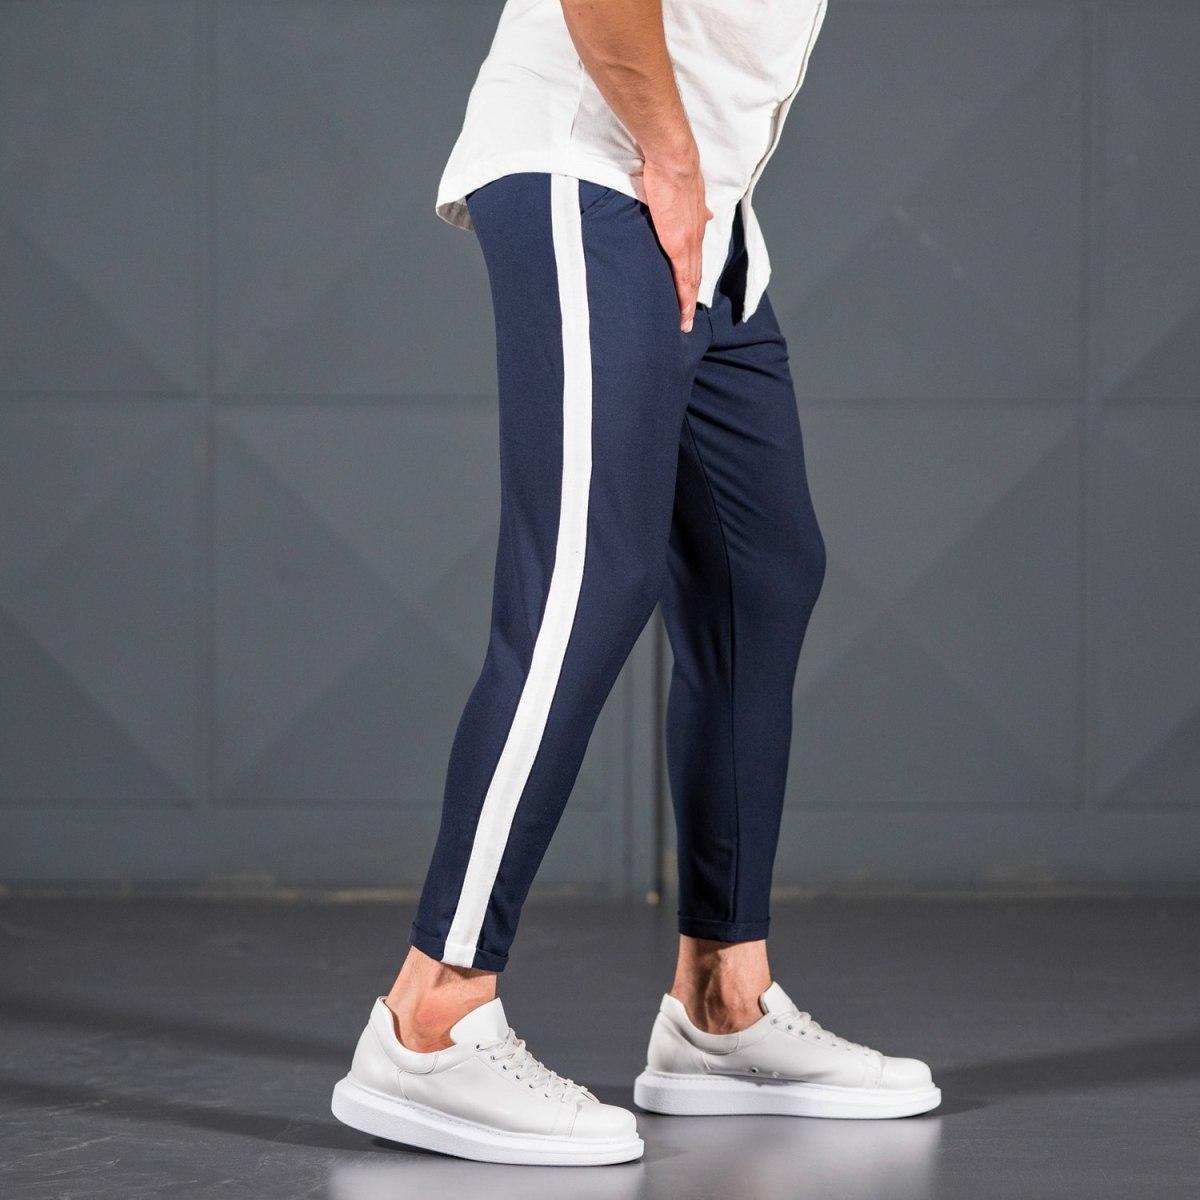 Men's Navy Blue Trousers...